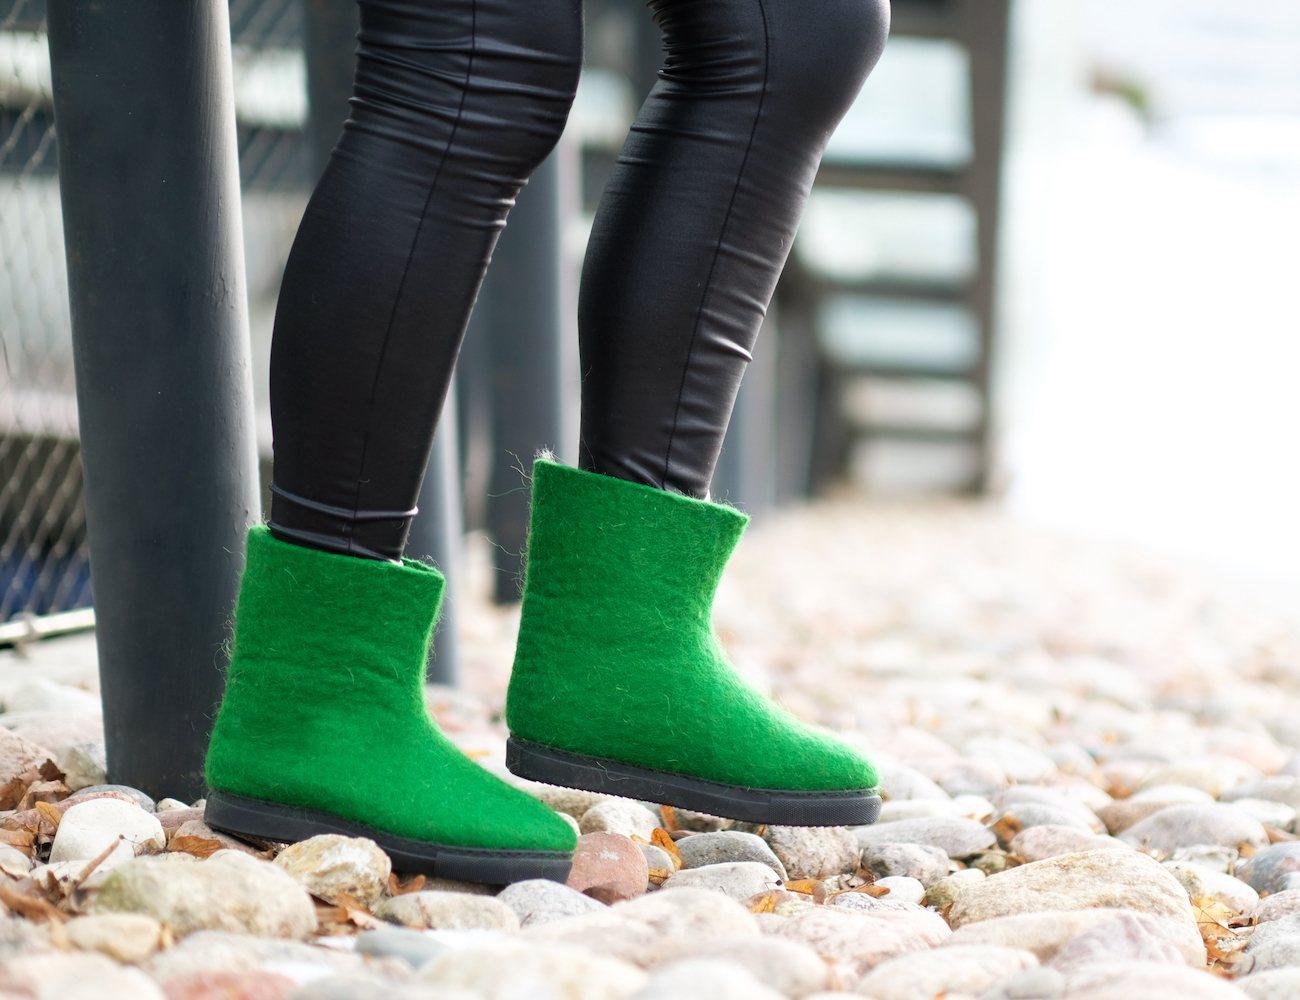 Felt Forma Women's Eco-Friendly Wool Snow Boots